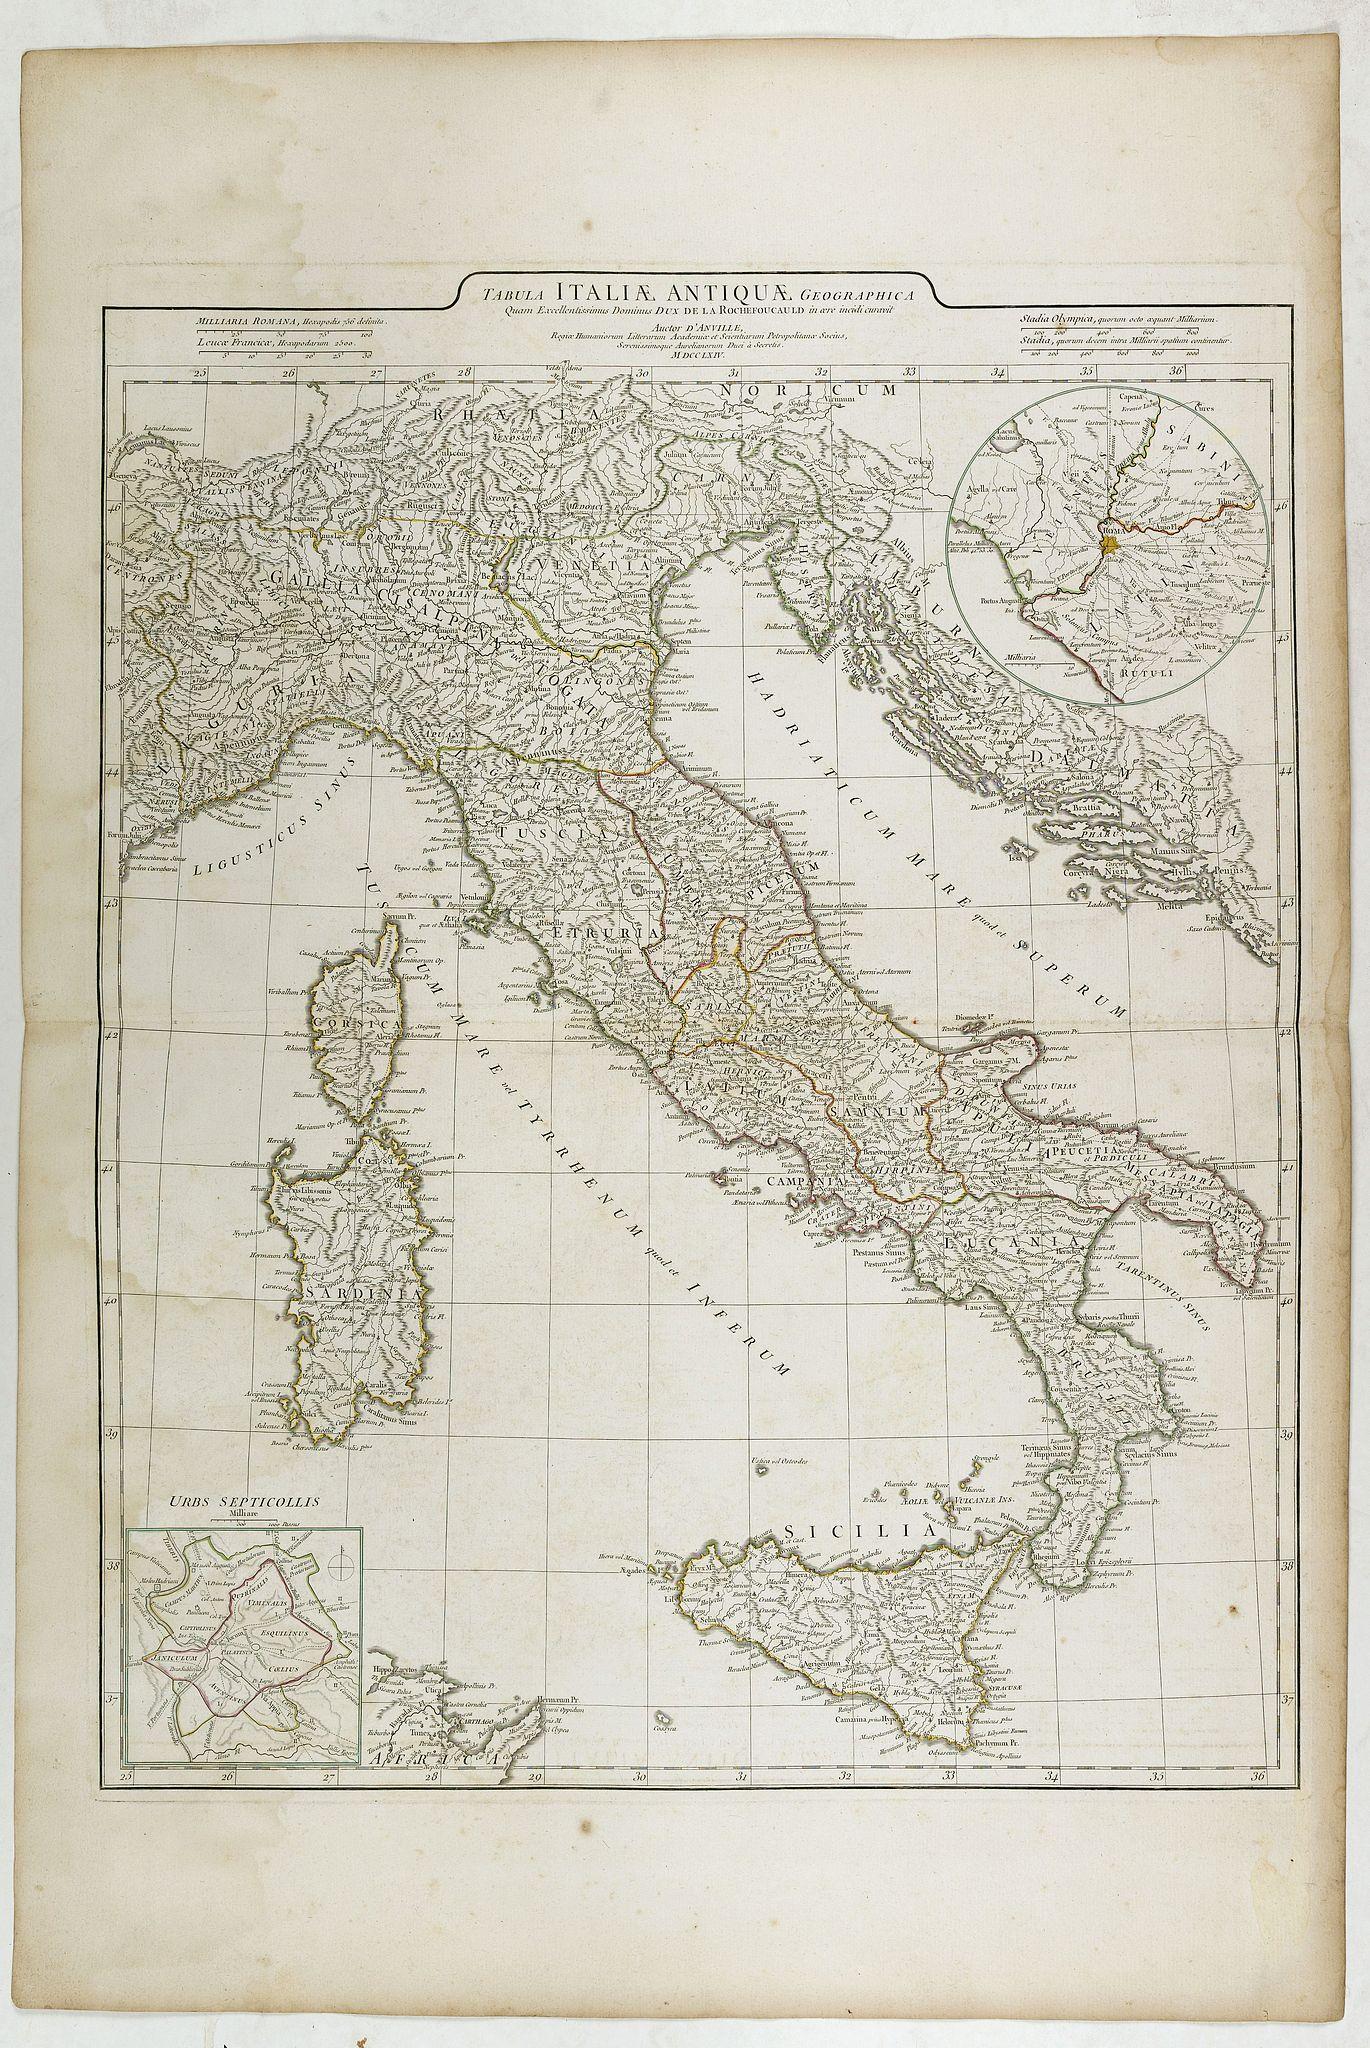 D'ANVILLE, J-B-B. -  Tabula Italiae Antiquae. . .